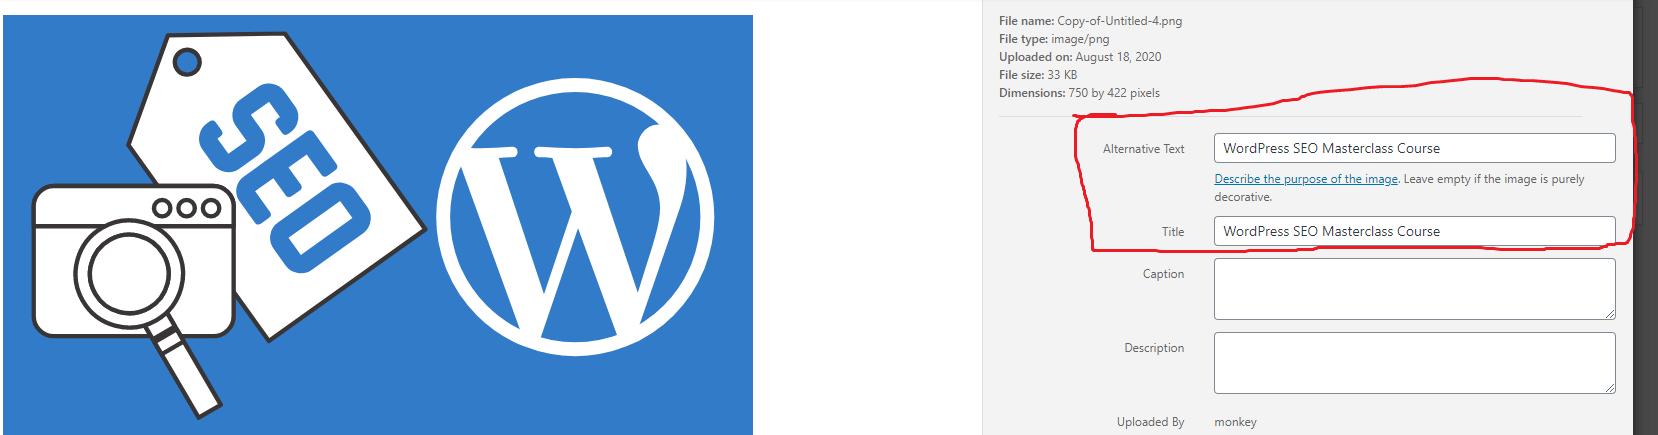 image file name and ALT tag